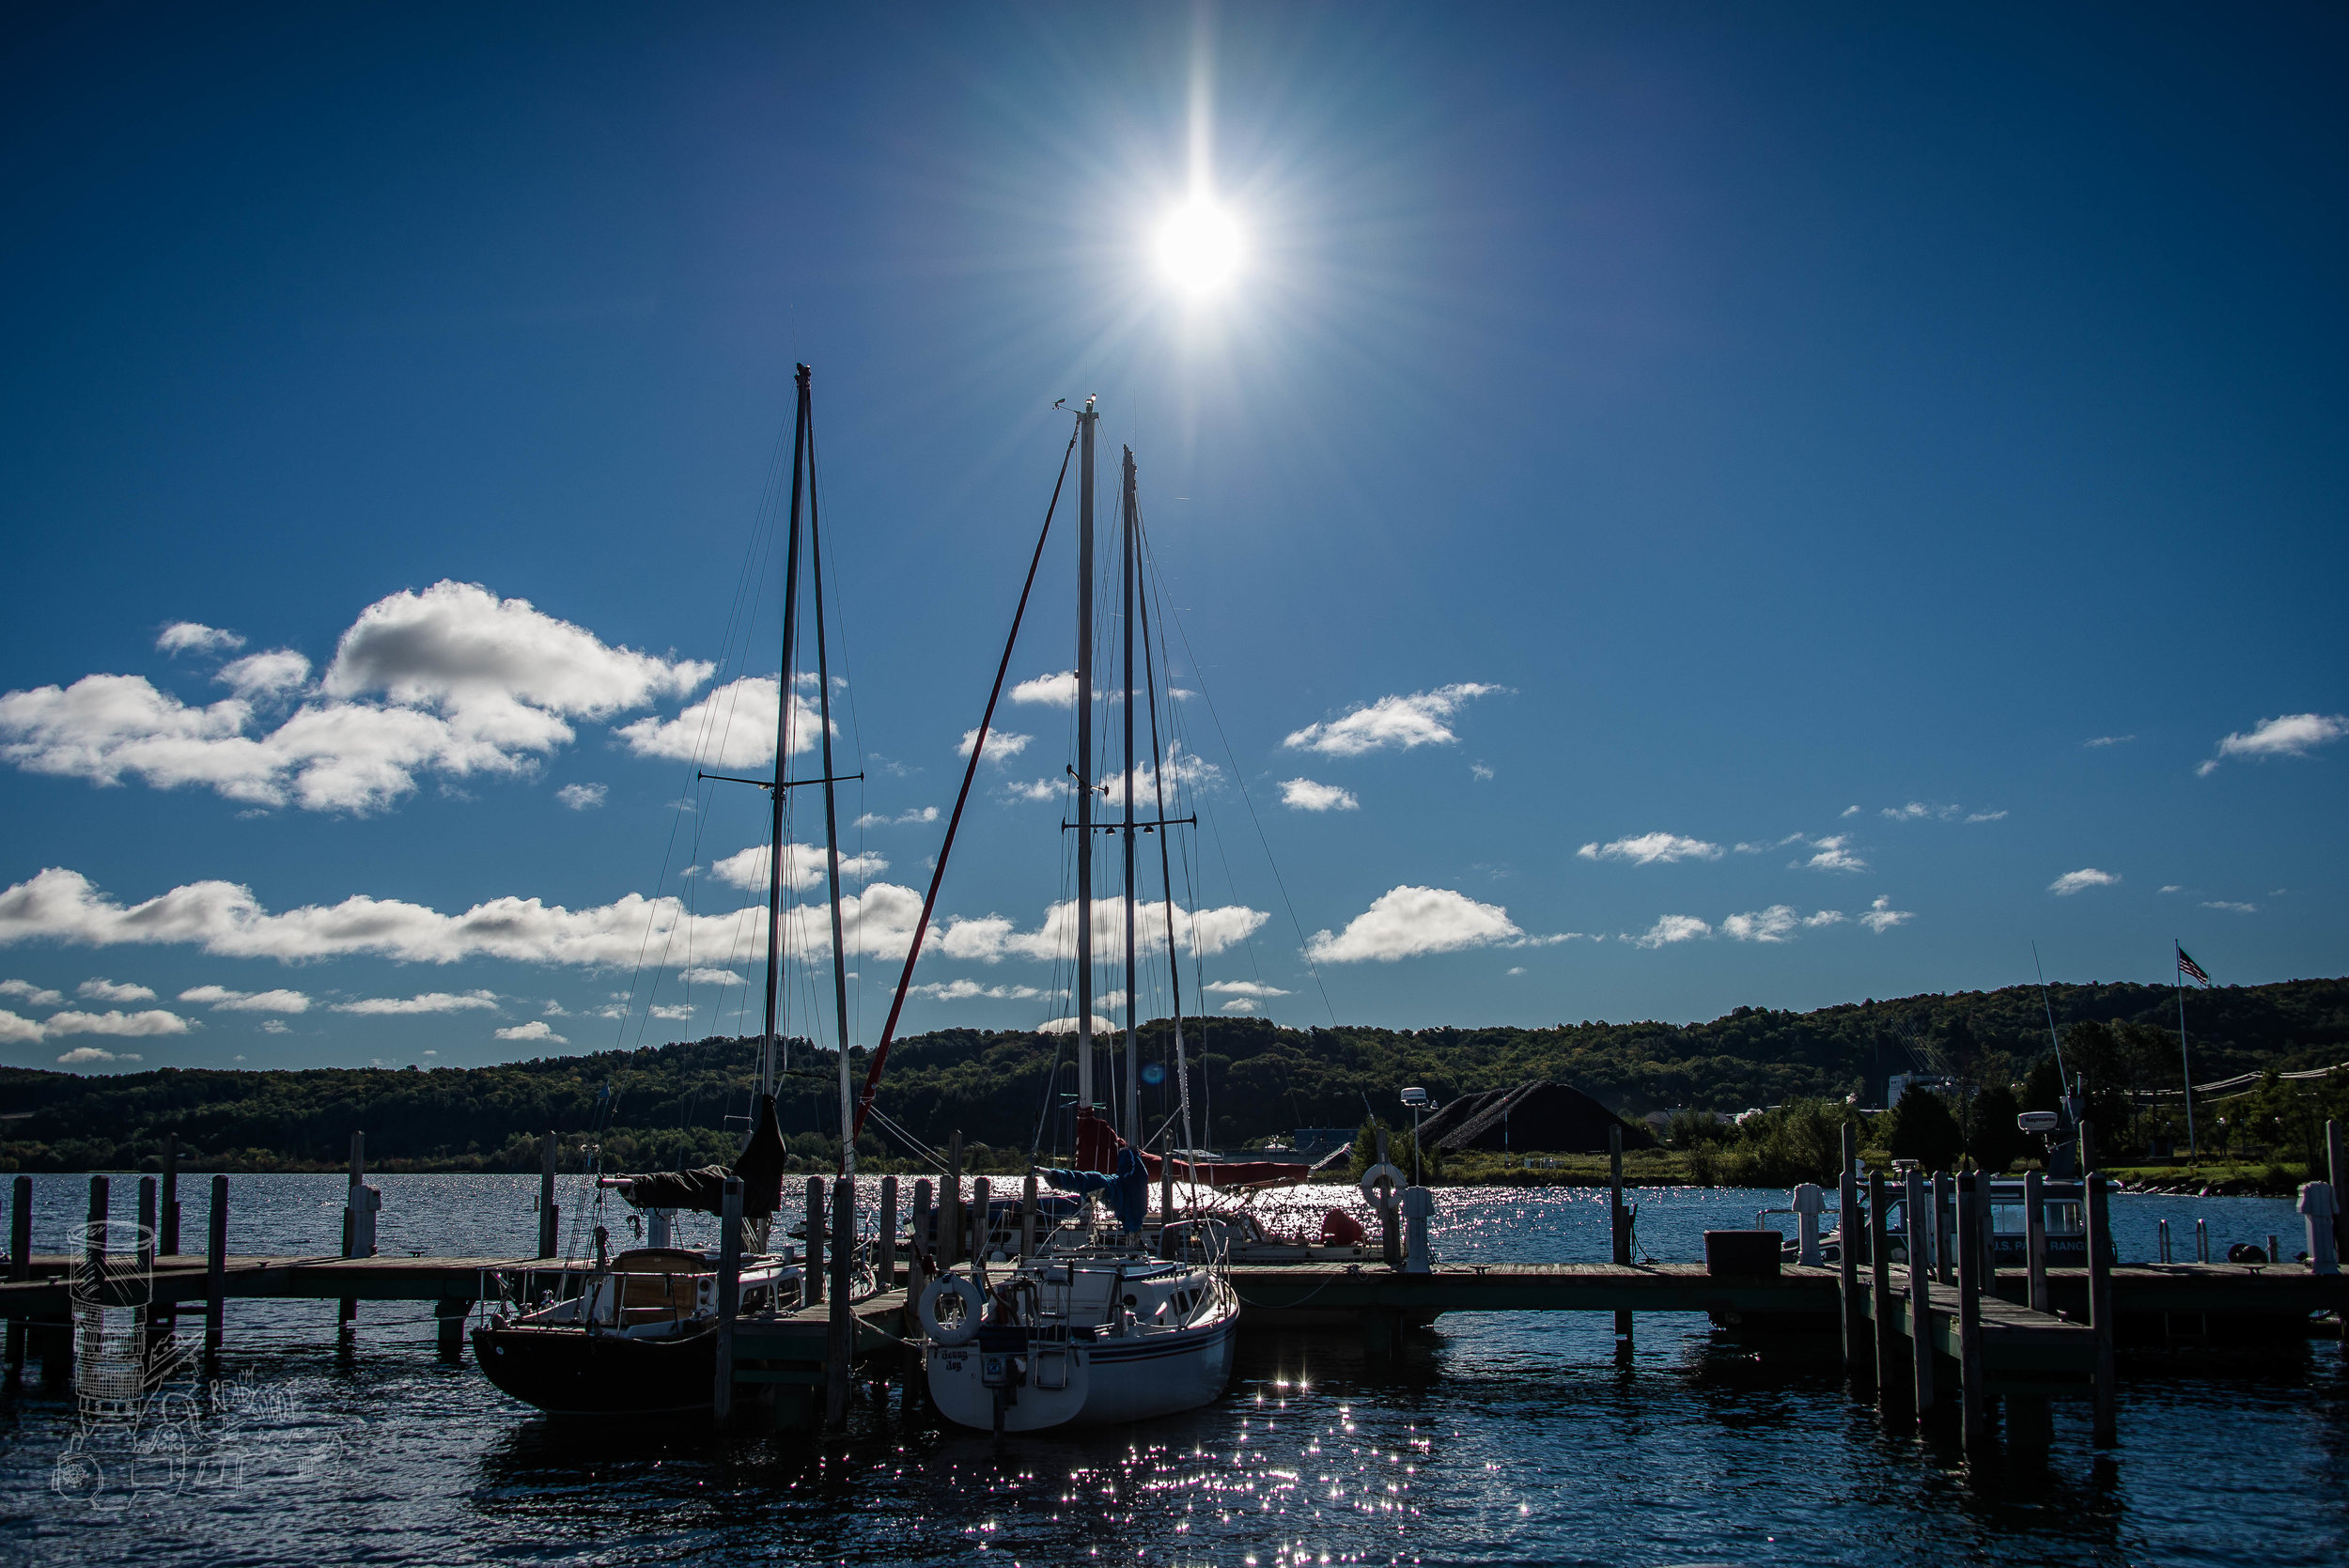 Munising Docks